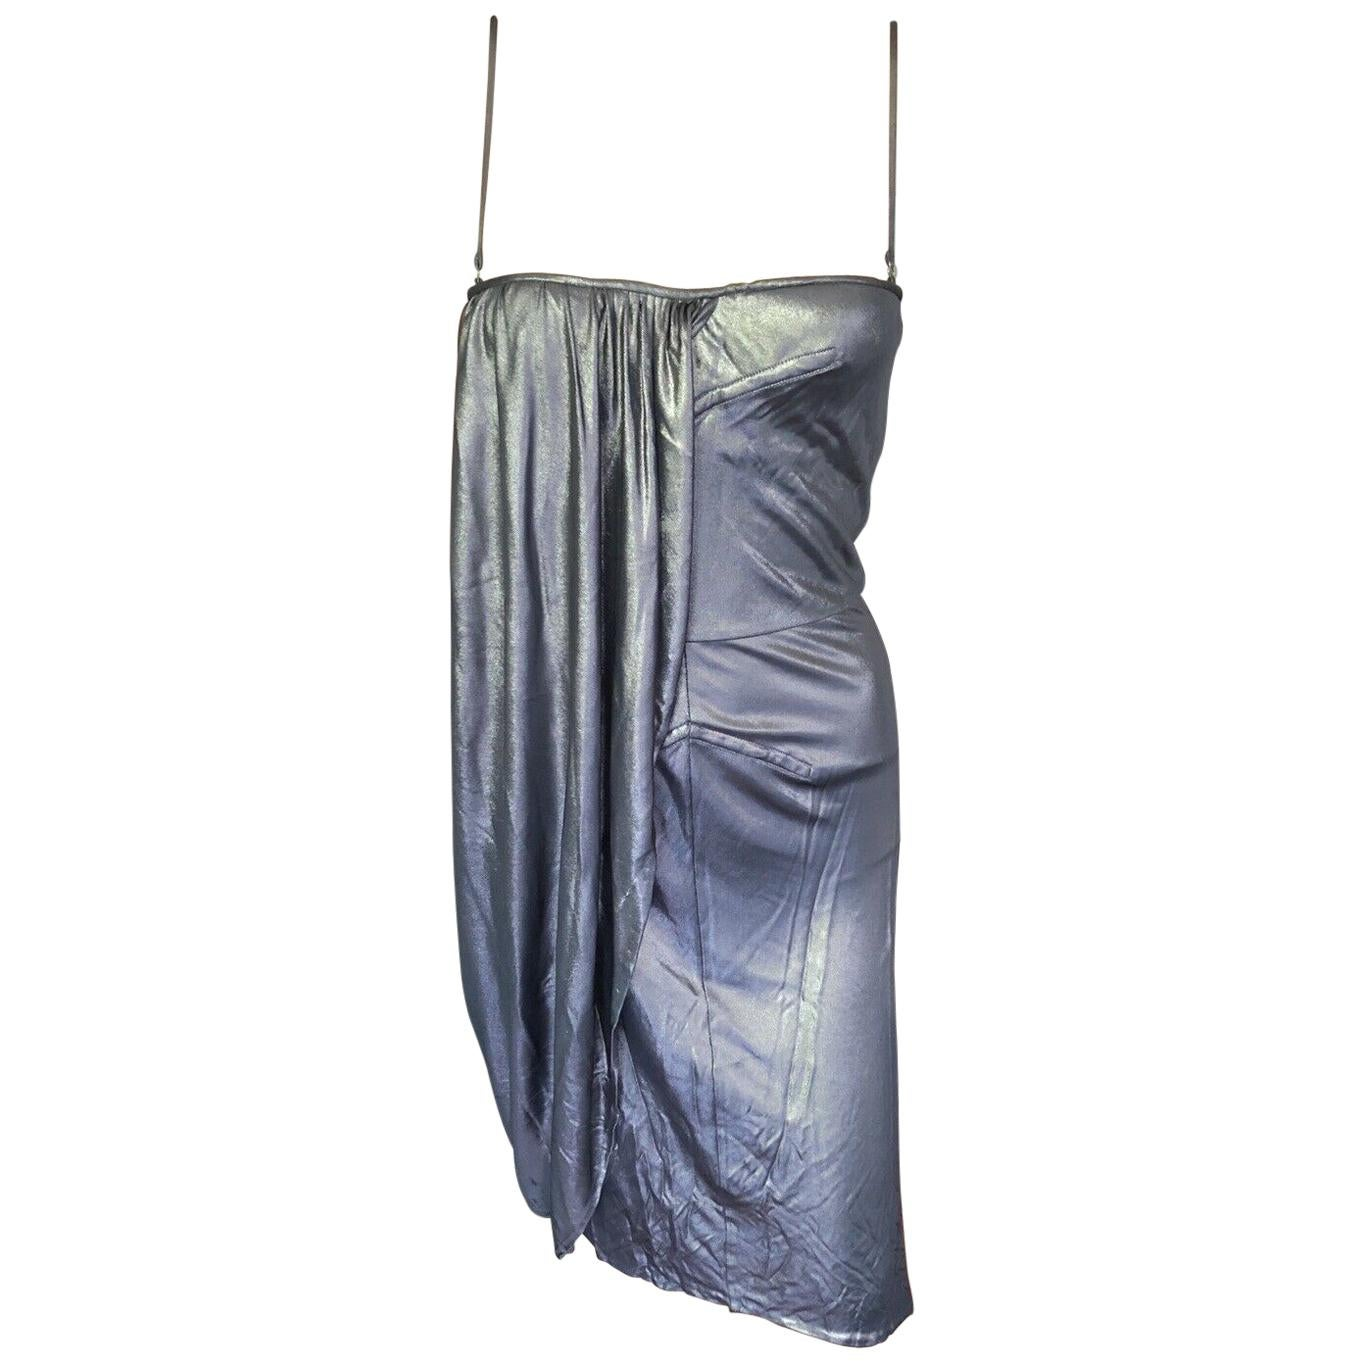 Christian Dior Resort 2007 Runway Metallic Draped Dress